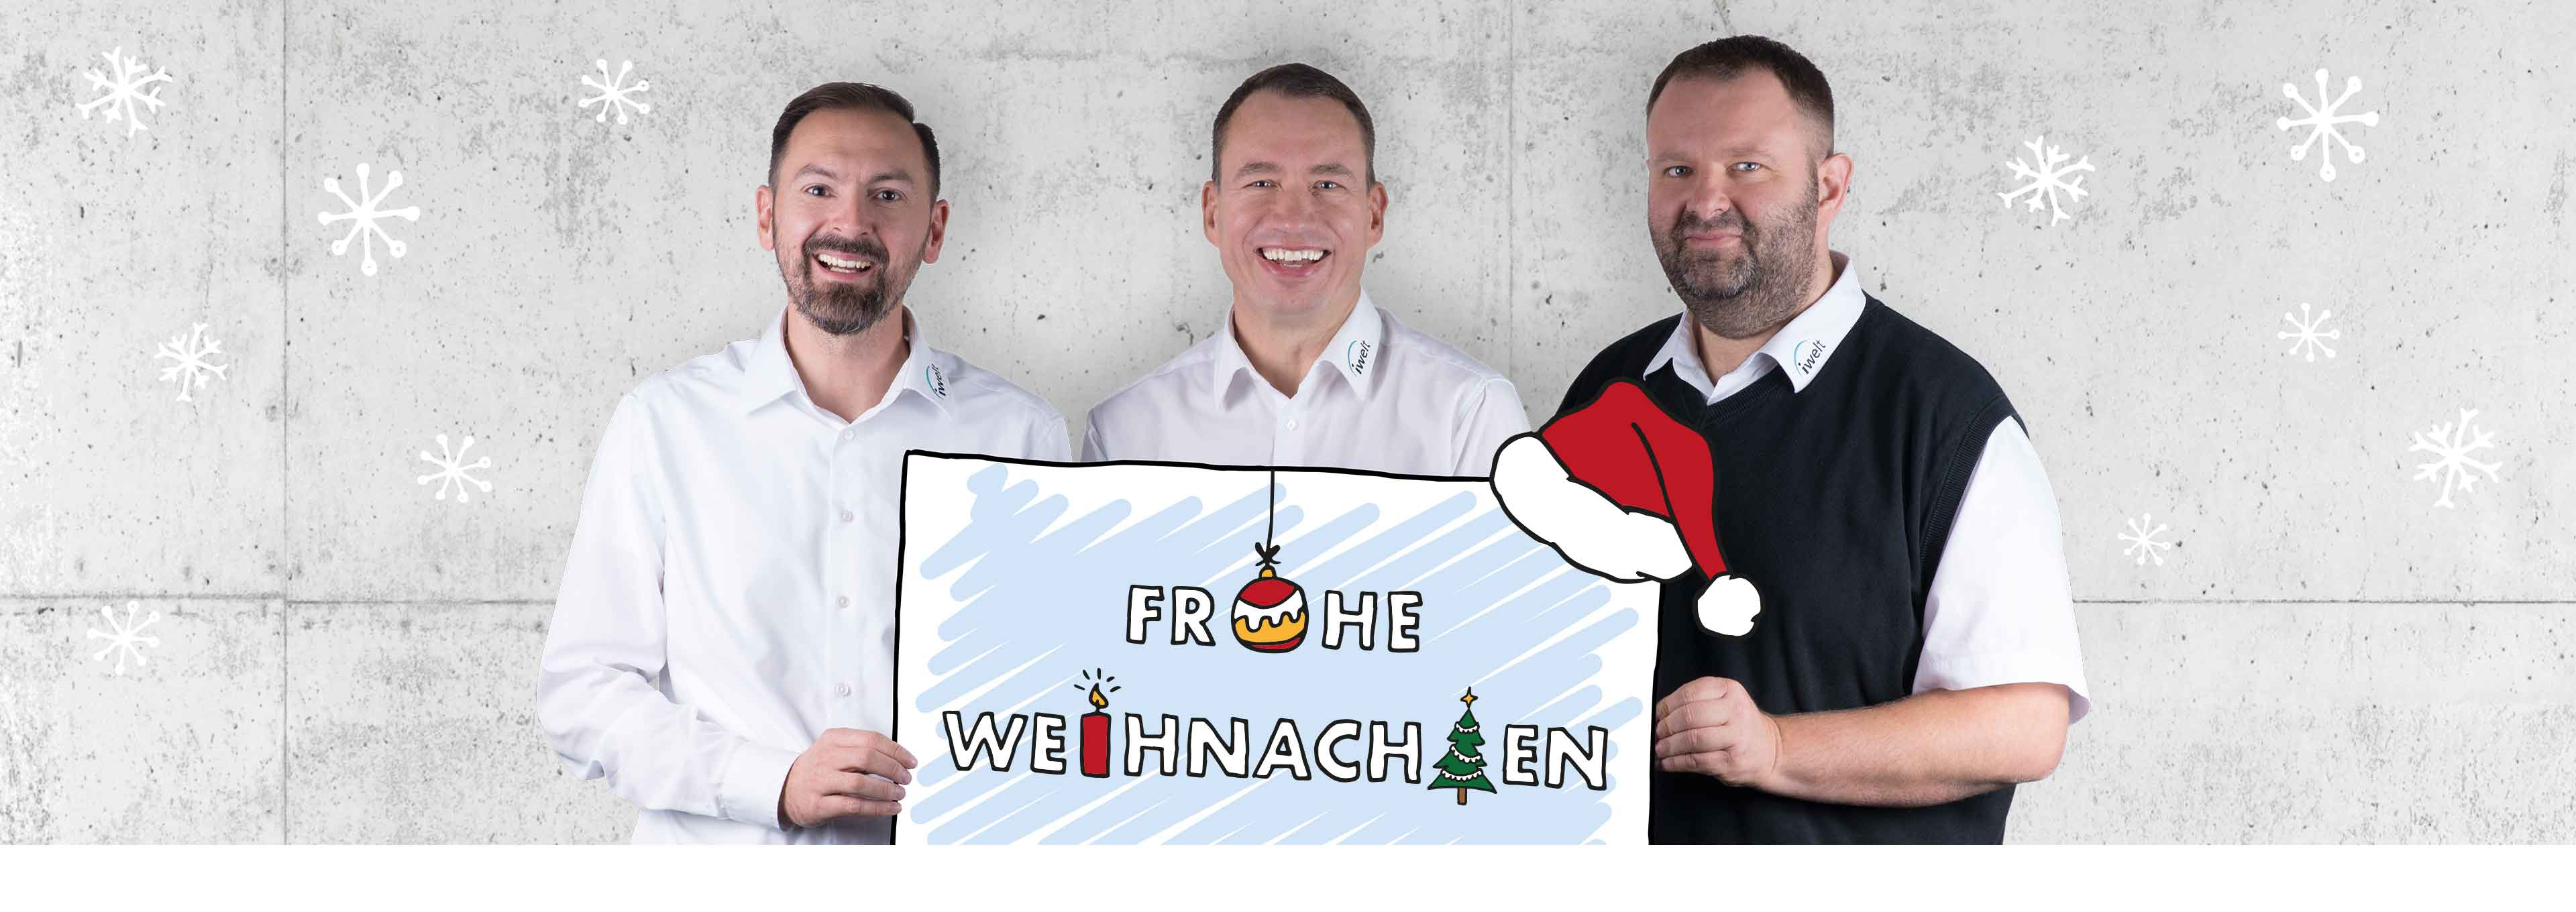 Frohe Weihnachten wünscht die iWelt AG